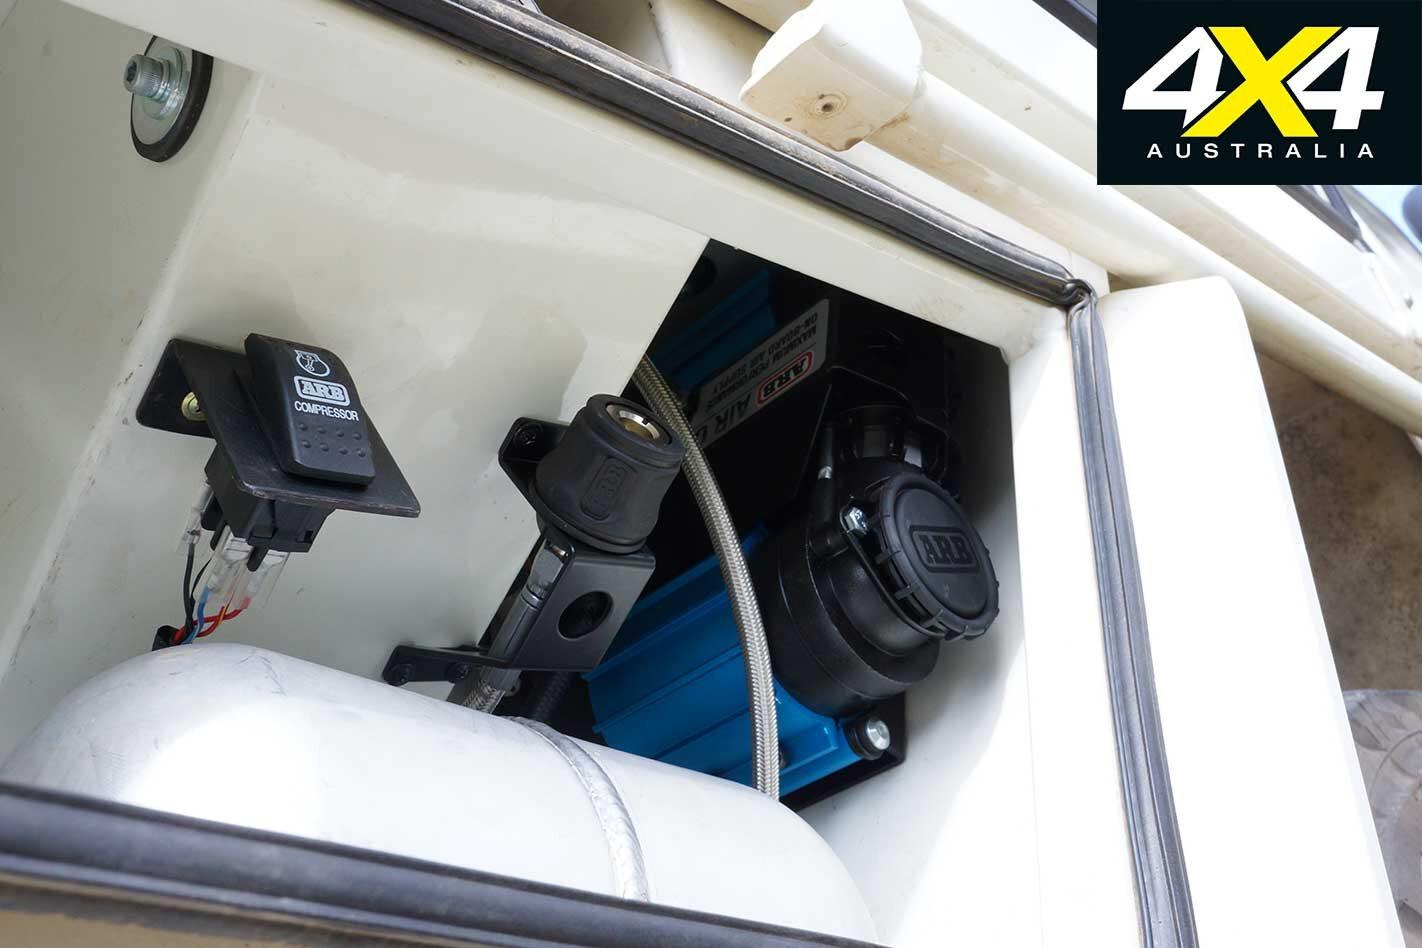 2013 Toyota Land Cruiser 79 Series ARB Compressor Jpg